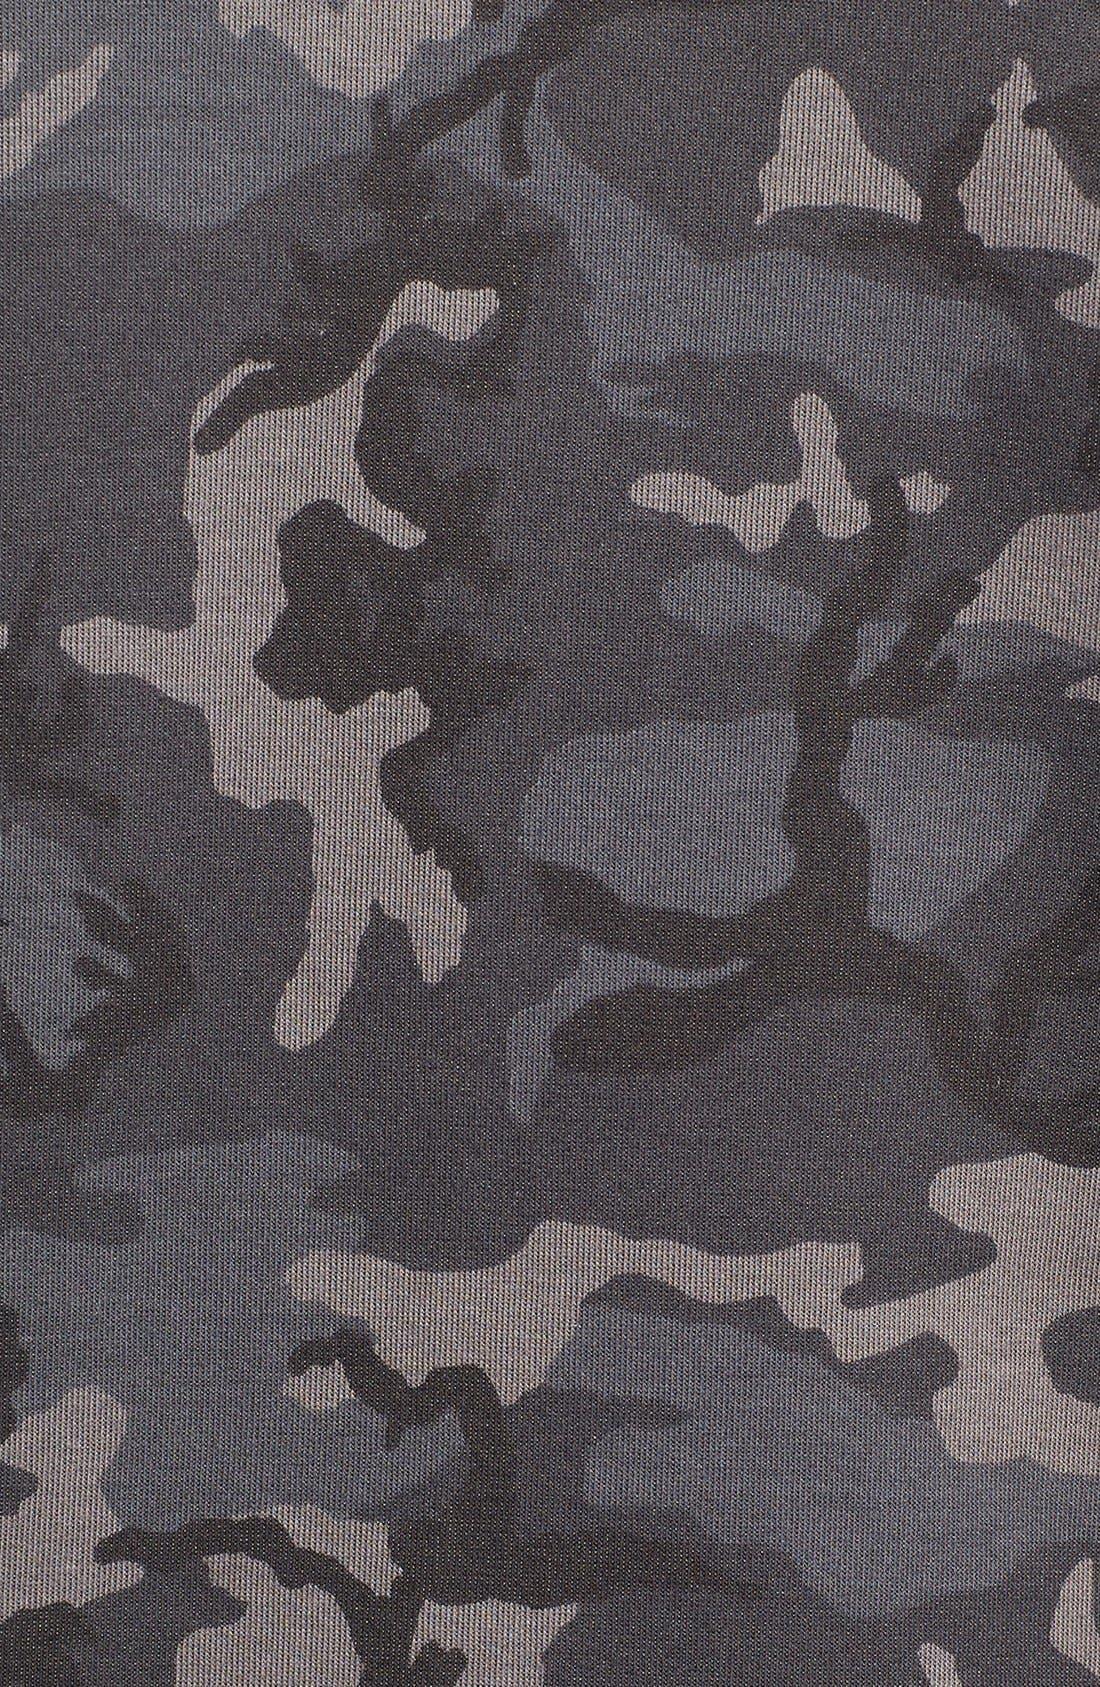 NIKE,                             'Tech Fleece Hero' Camo Full Zip Hoodie,                             Alternate thumbnail 3, color,                             233